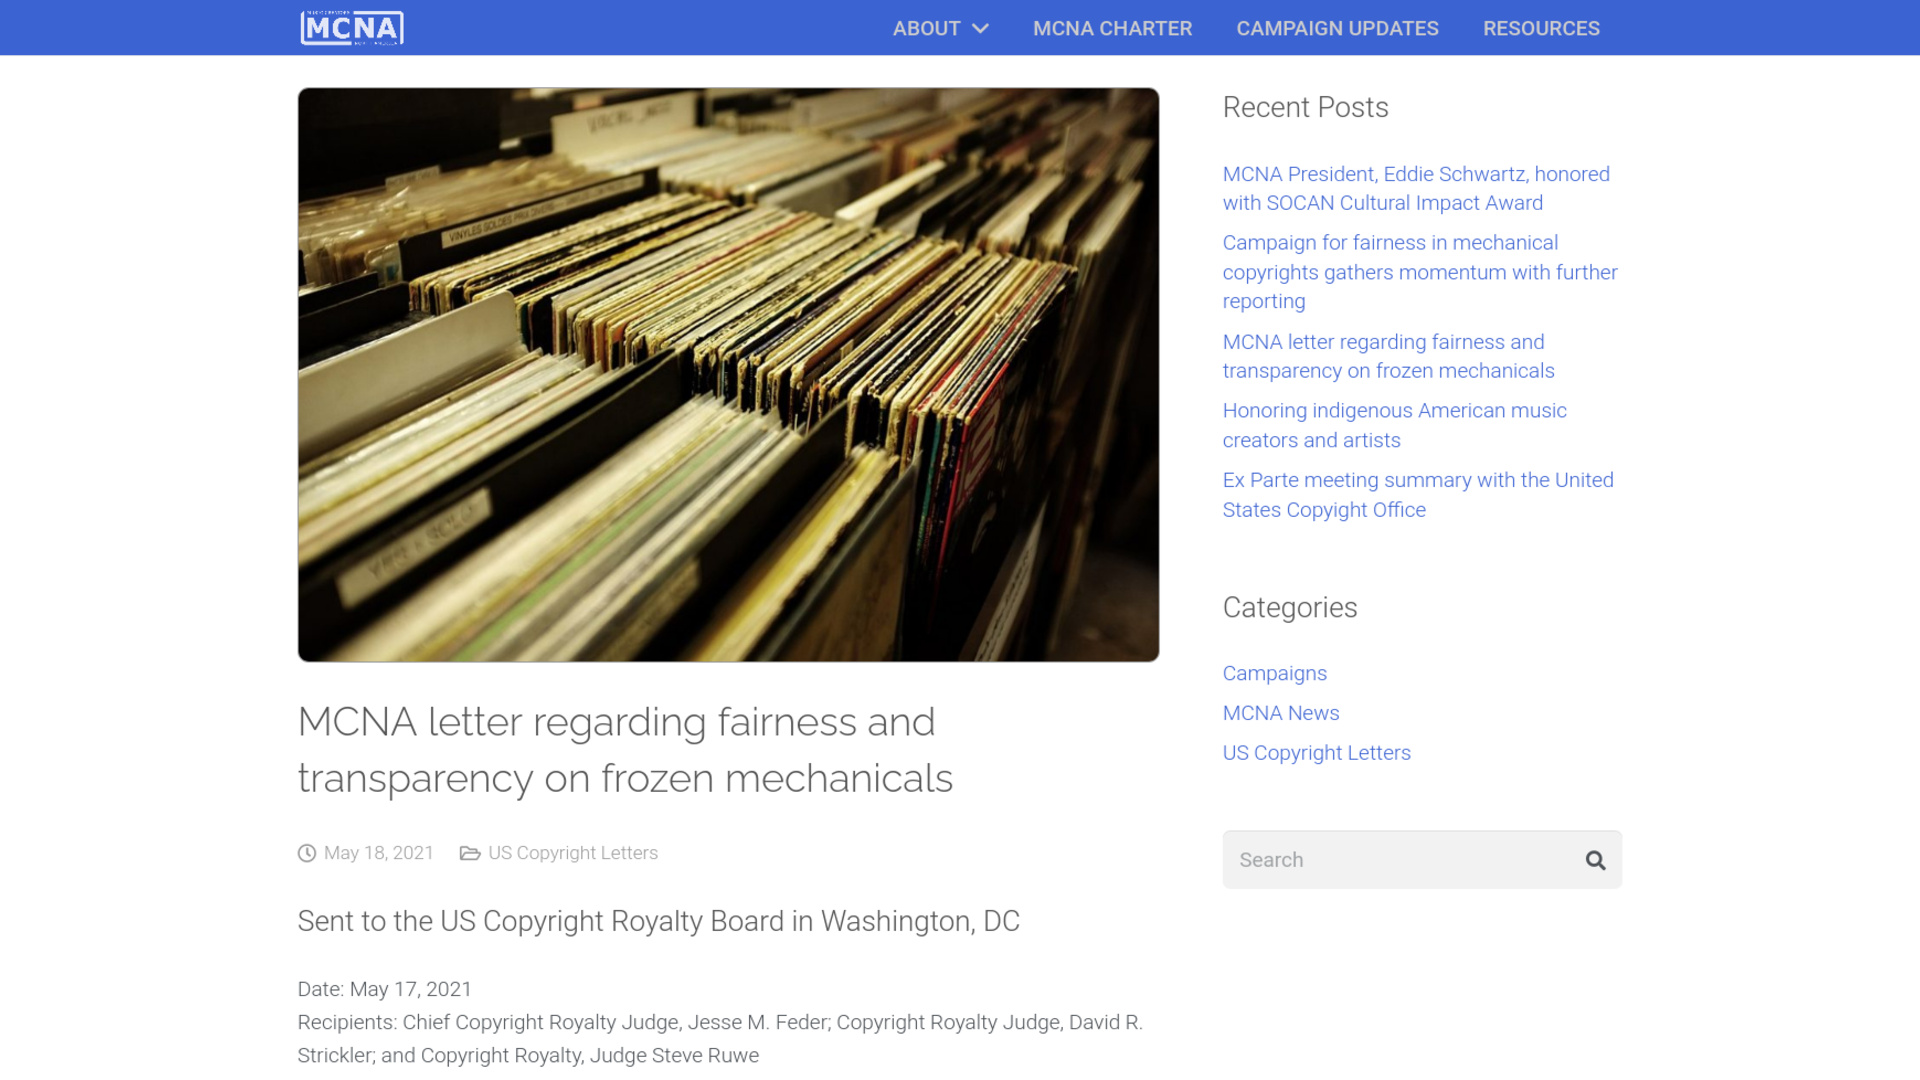 Fairness Rocks News MCNA letter regarding fairness and transparency on frozen mechanicals